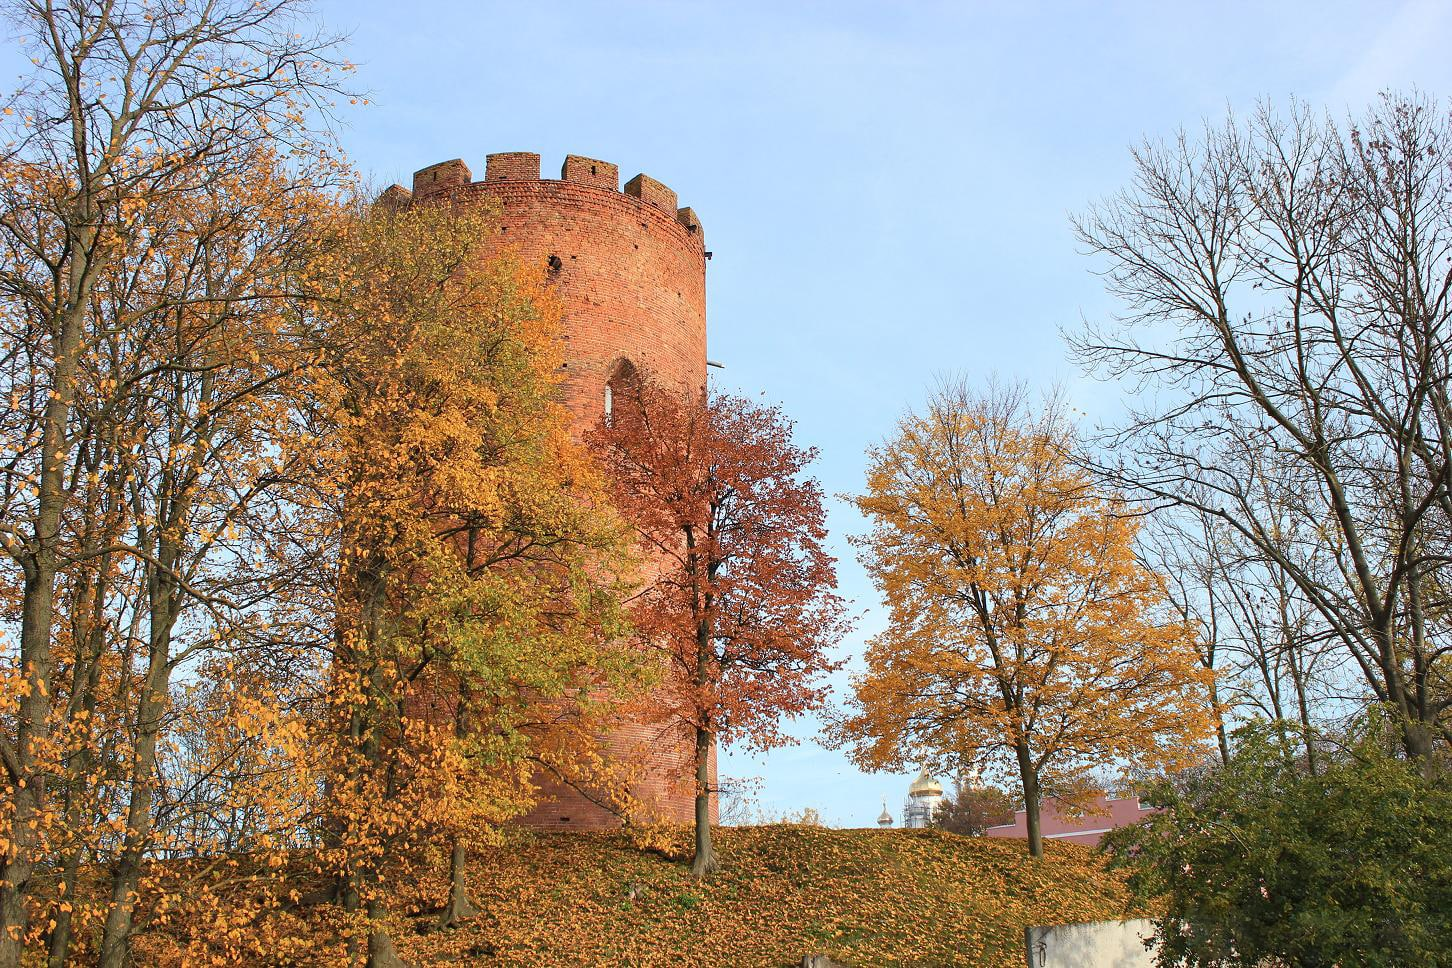 Башня из ниоткуда